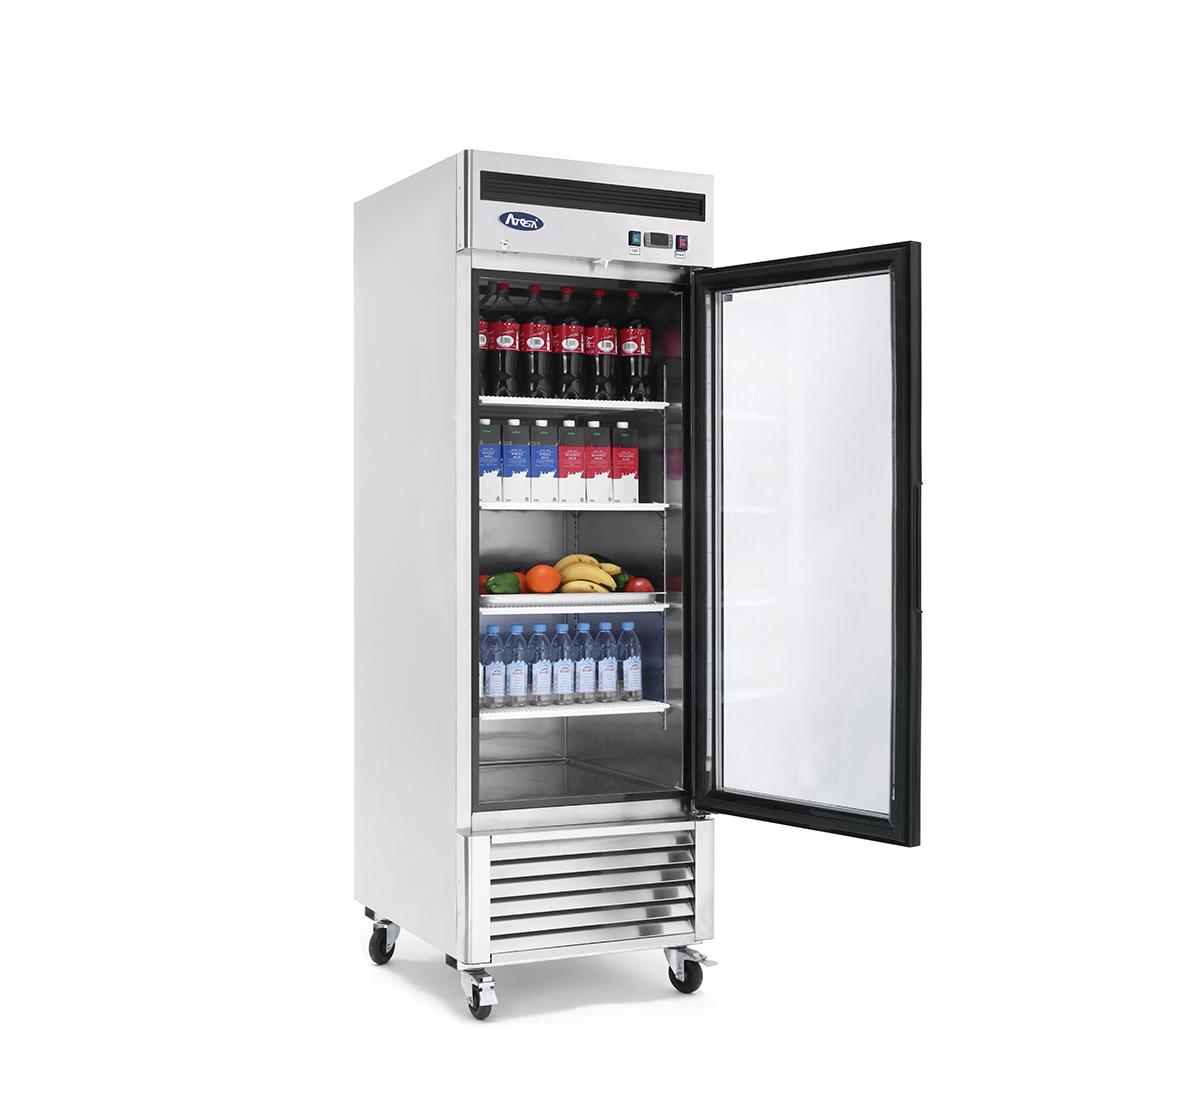 Commercial Refrigerator,ATOSA MCF8705 Bottom Mount 1 One Glass Door Refrigerator